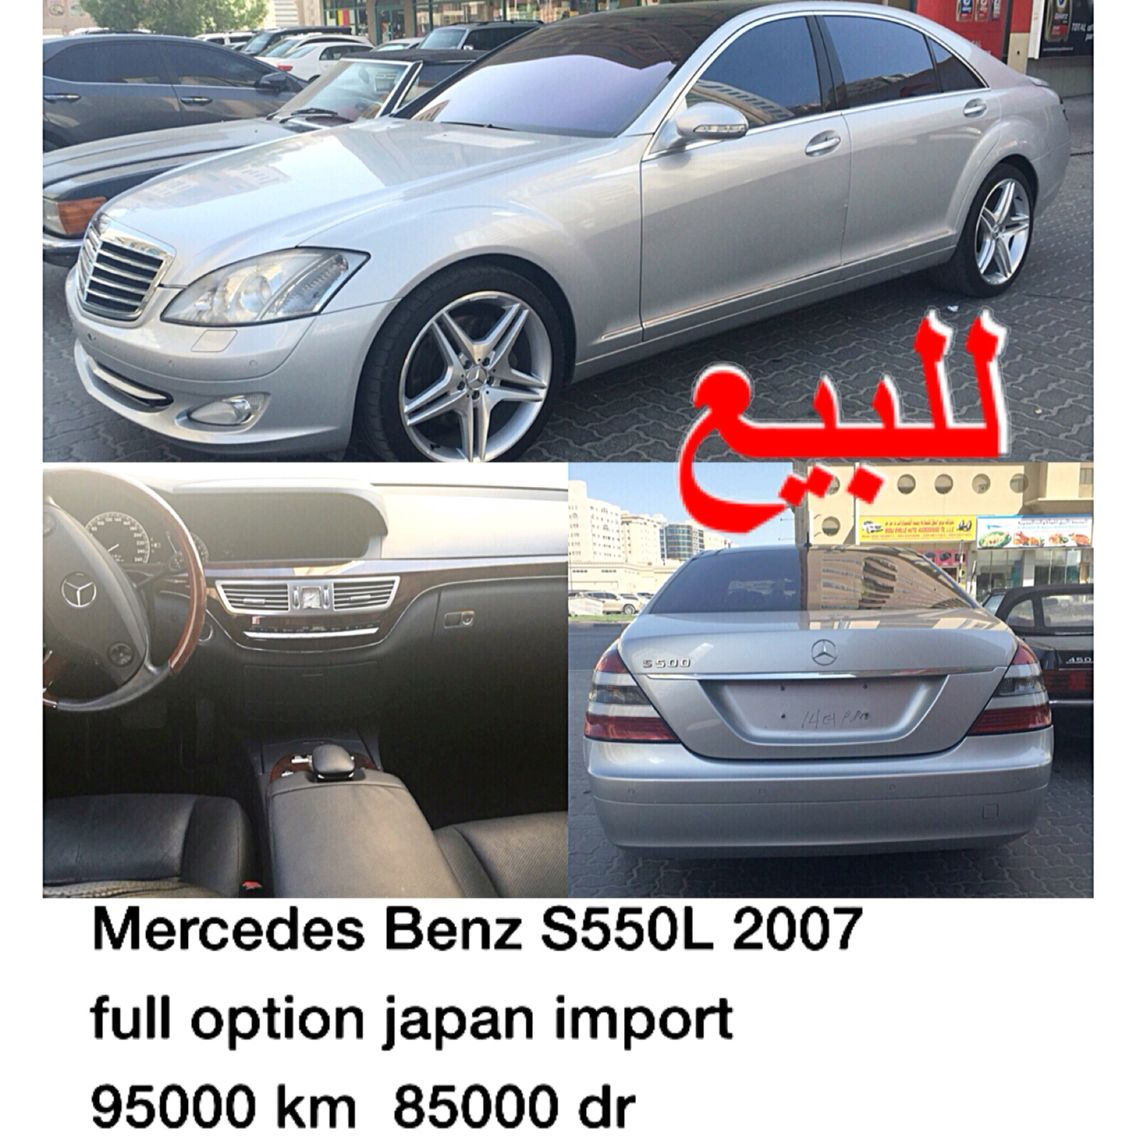 مرسيدس للبيع Mercedes Benz S550l 2007 Full Option Japan Import 95000 Km 85000 Dr 0509025899 اعلانvip مرسيدس مرسدس الواتساب Mercedes Benz Benz Mercedes